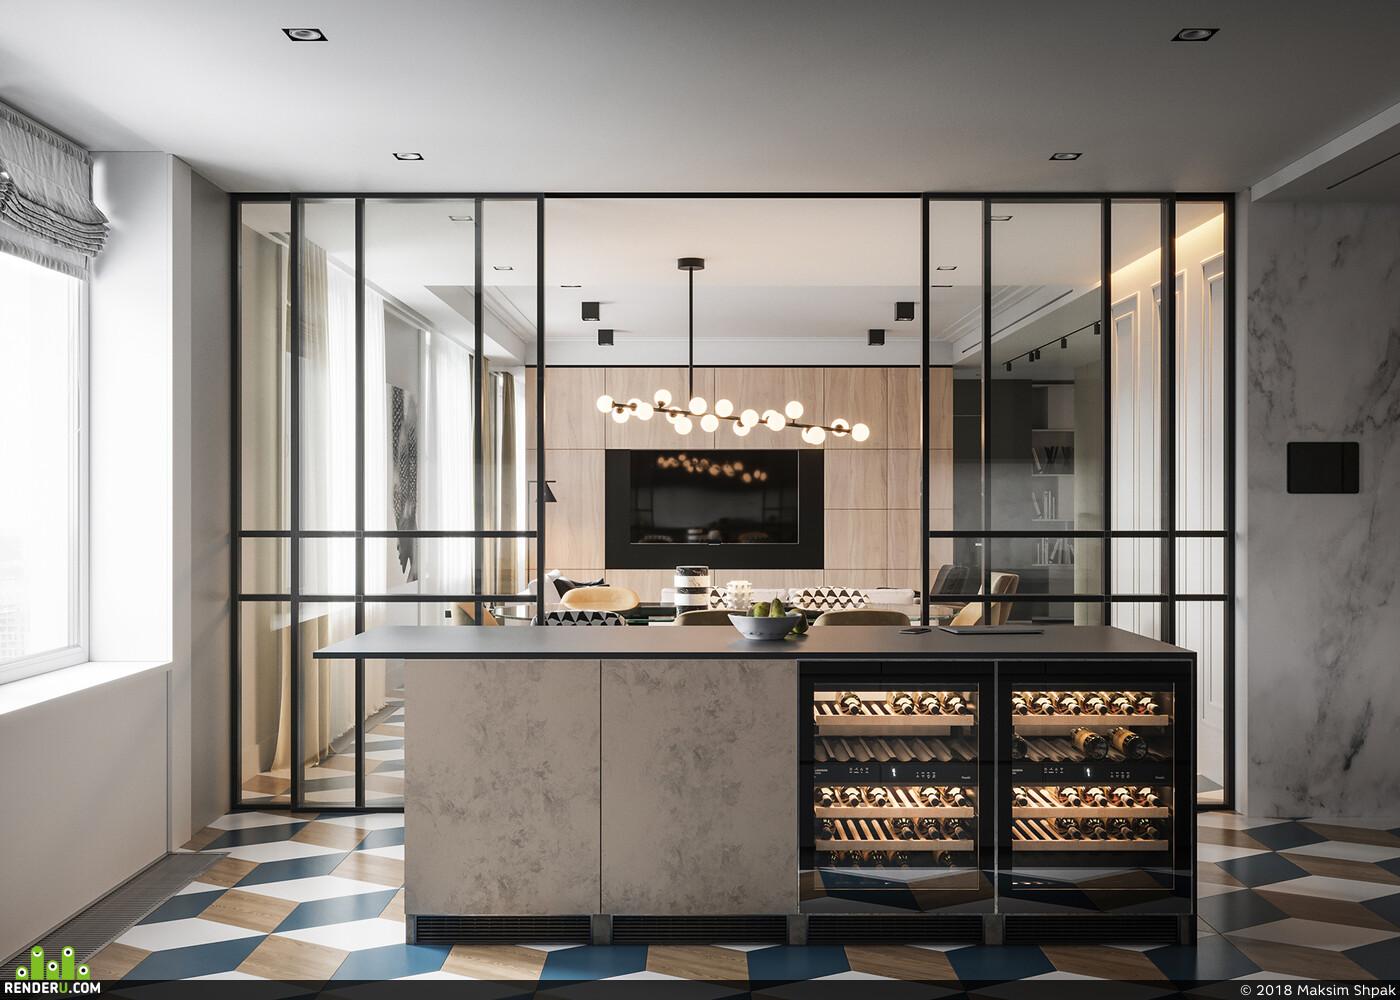 3ds max, interior interior design design 3D 3D Studio Max 3D архитектура интерьер дизайн интерьера интерьер, visualization, Corona Renderer, визуализация